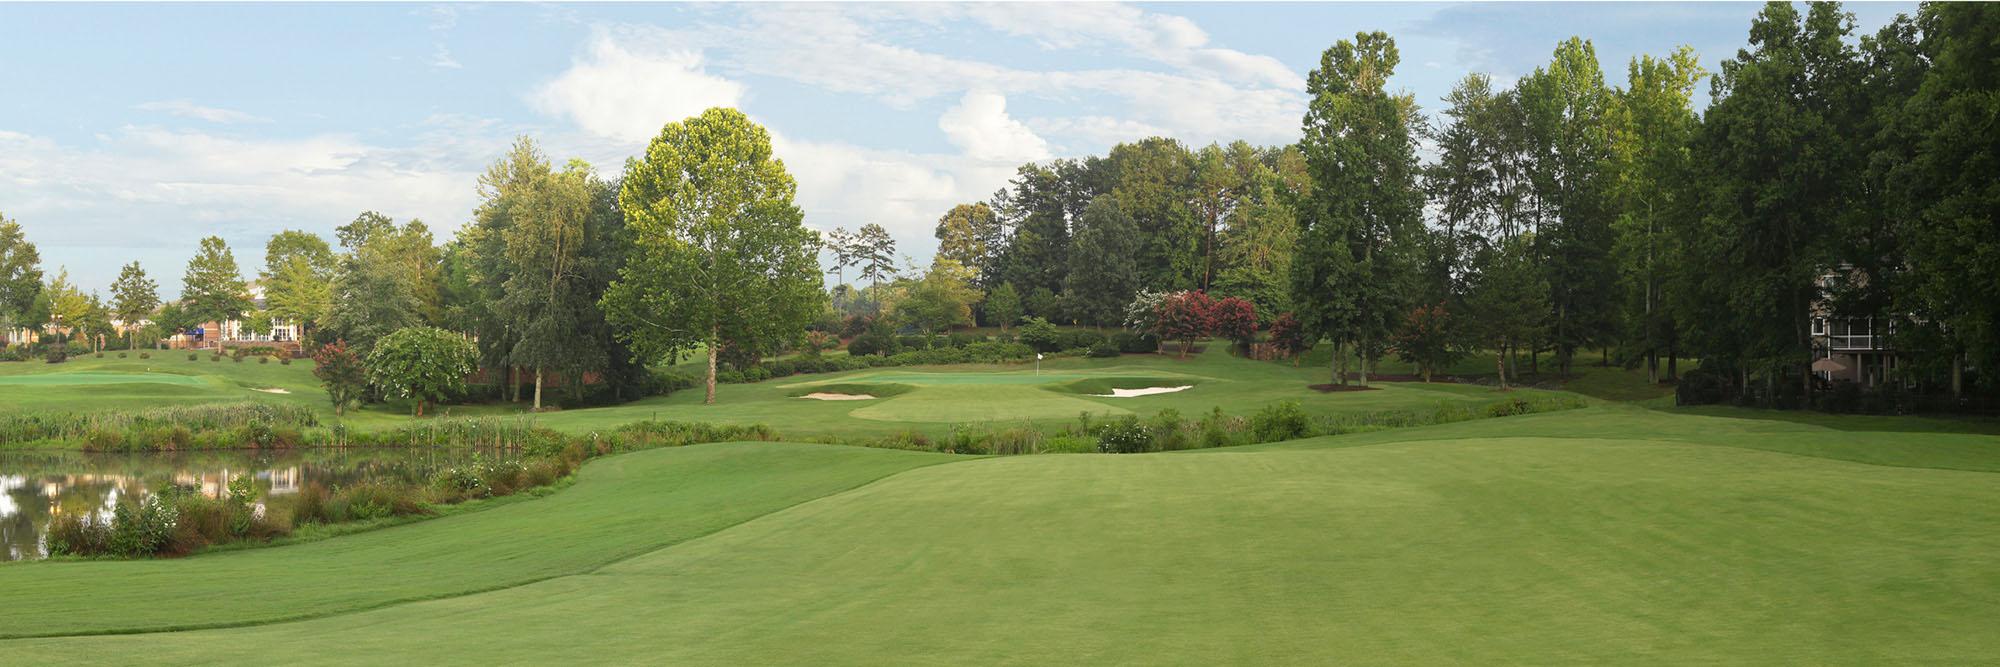 Golf Course Image - River Run Country Club No. 9